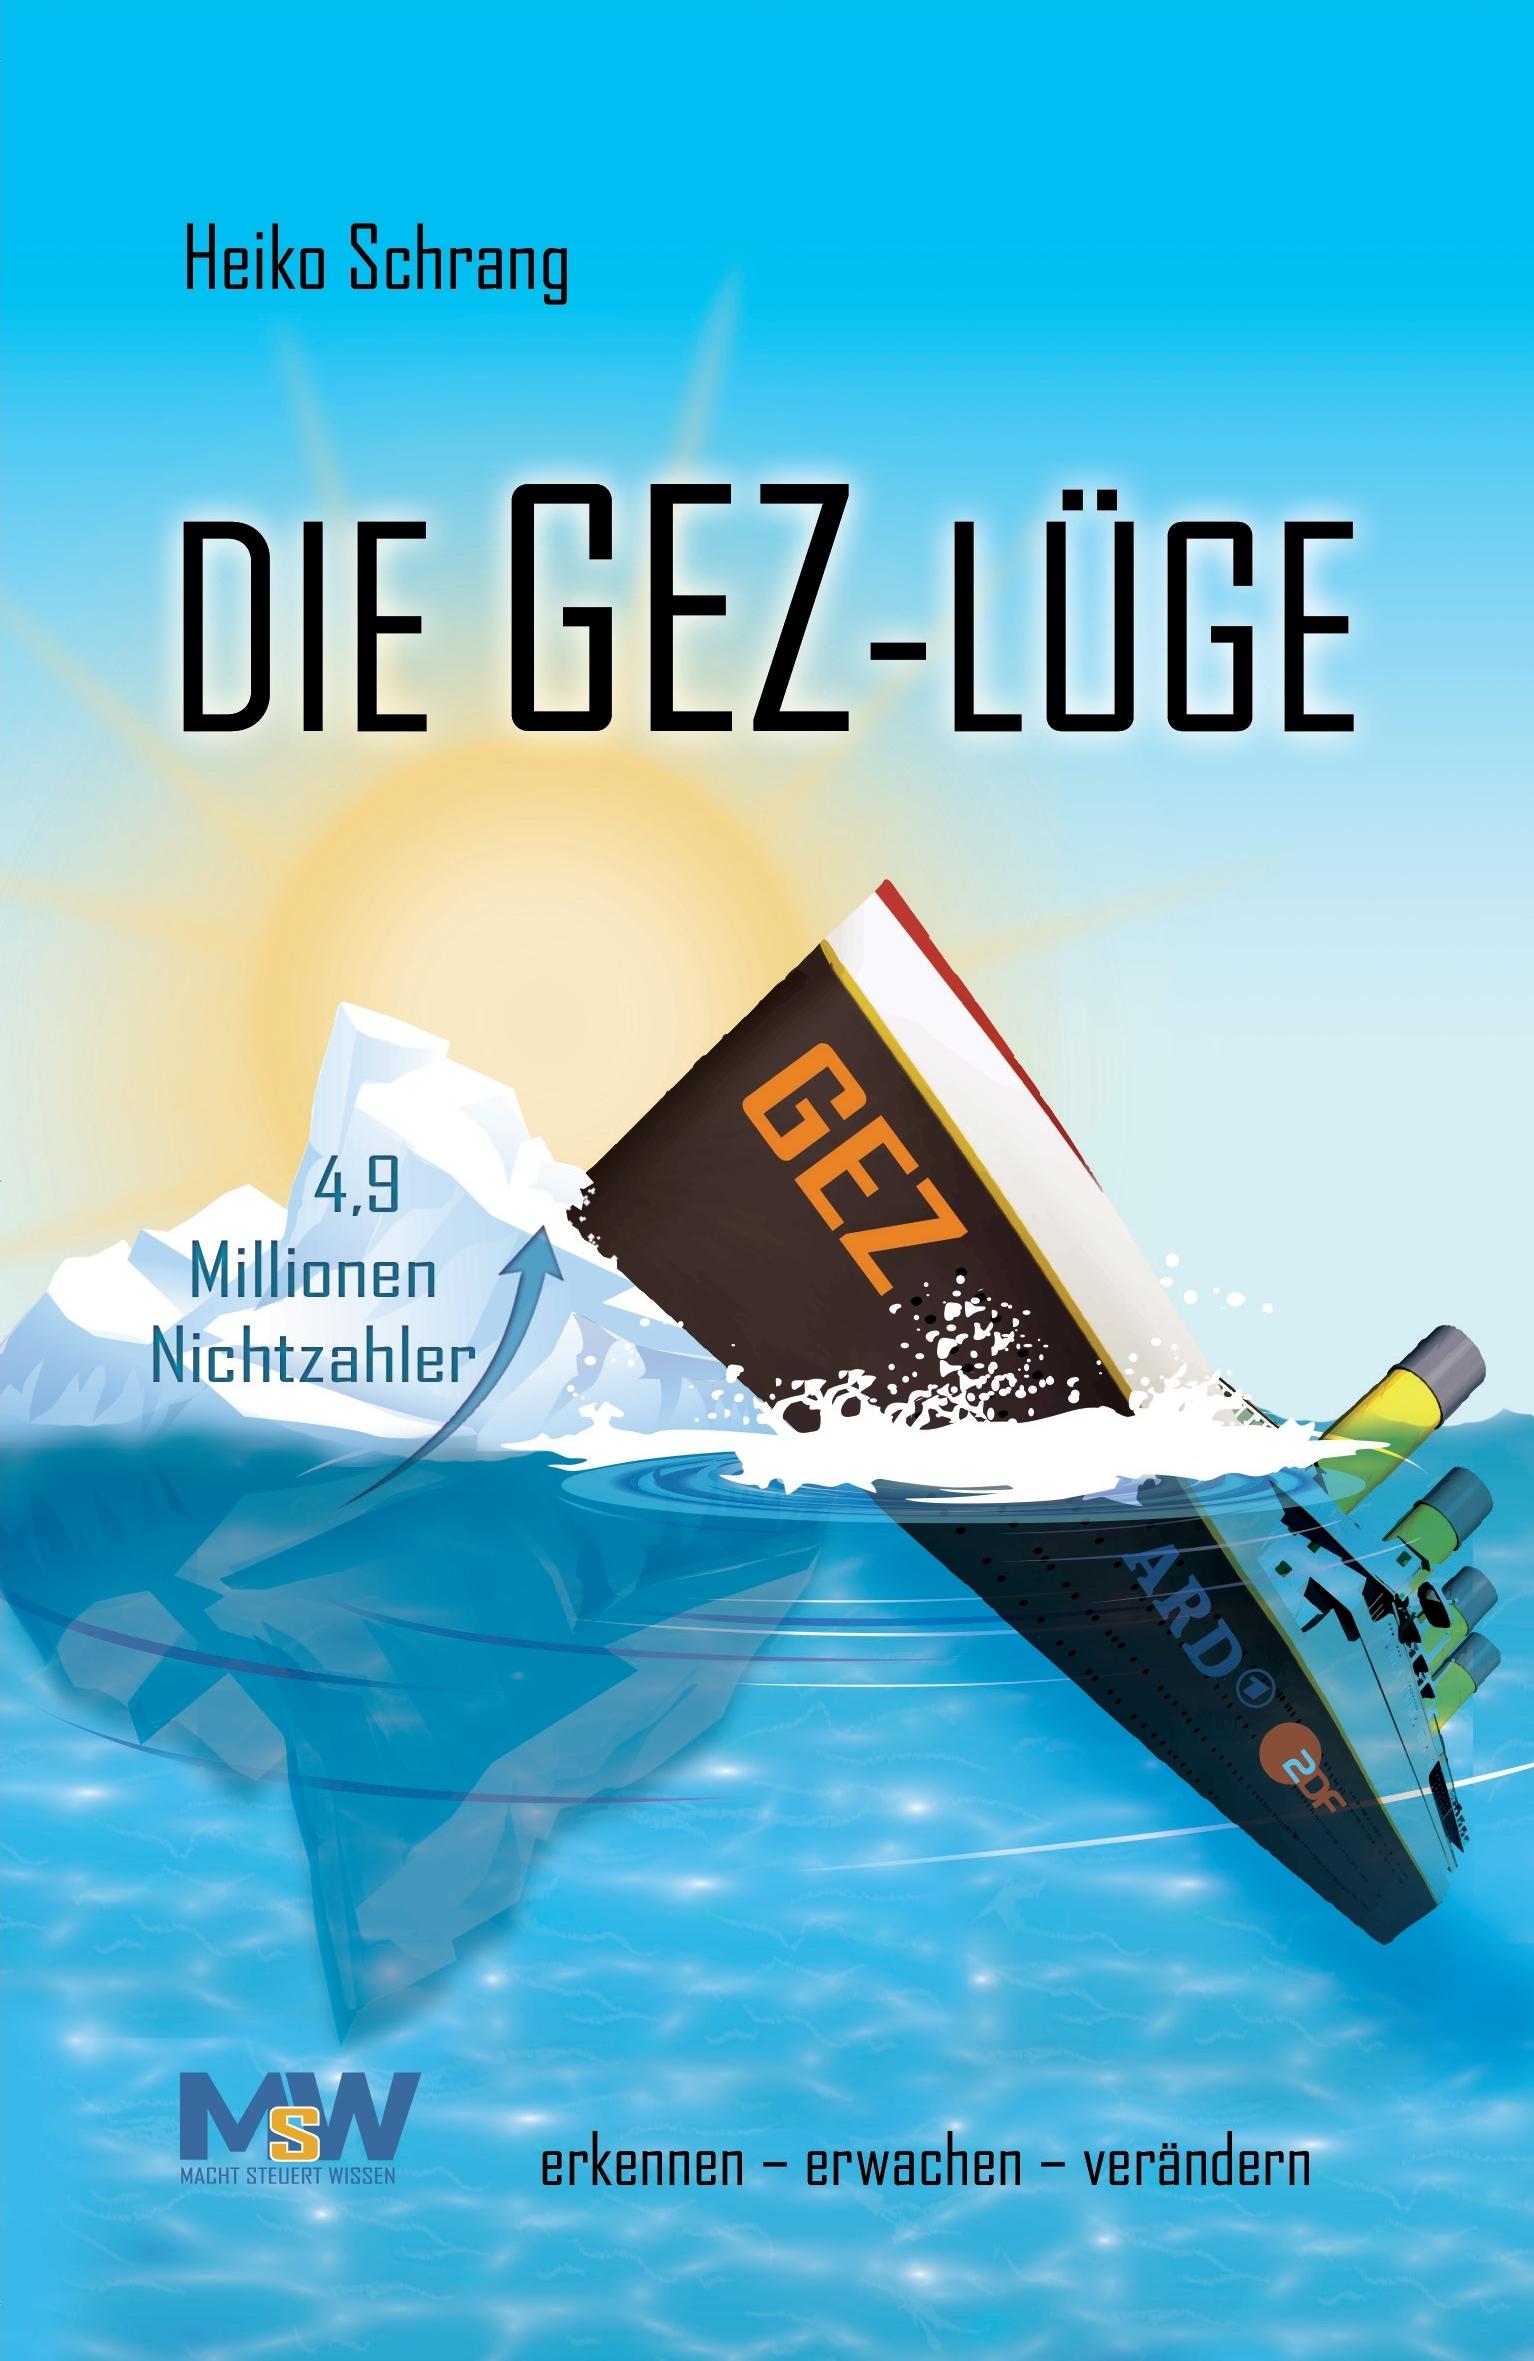 Foto: Cover Macht-steuert-Wissen Verlag